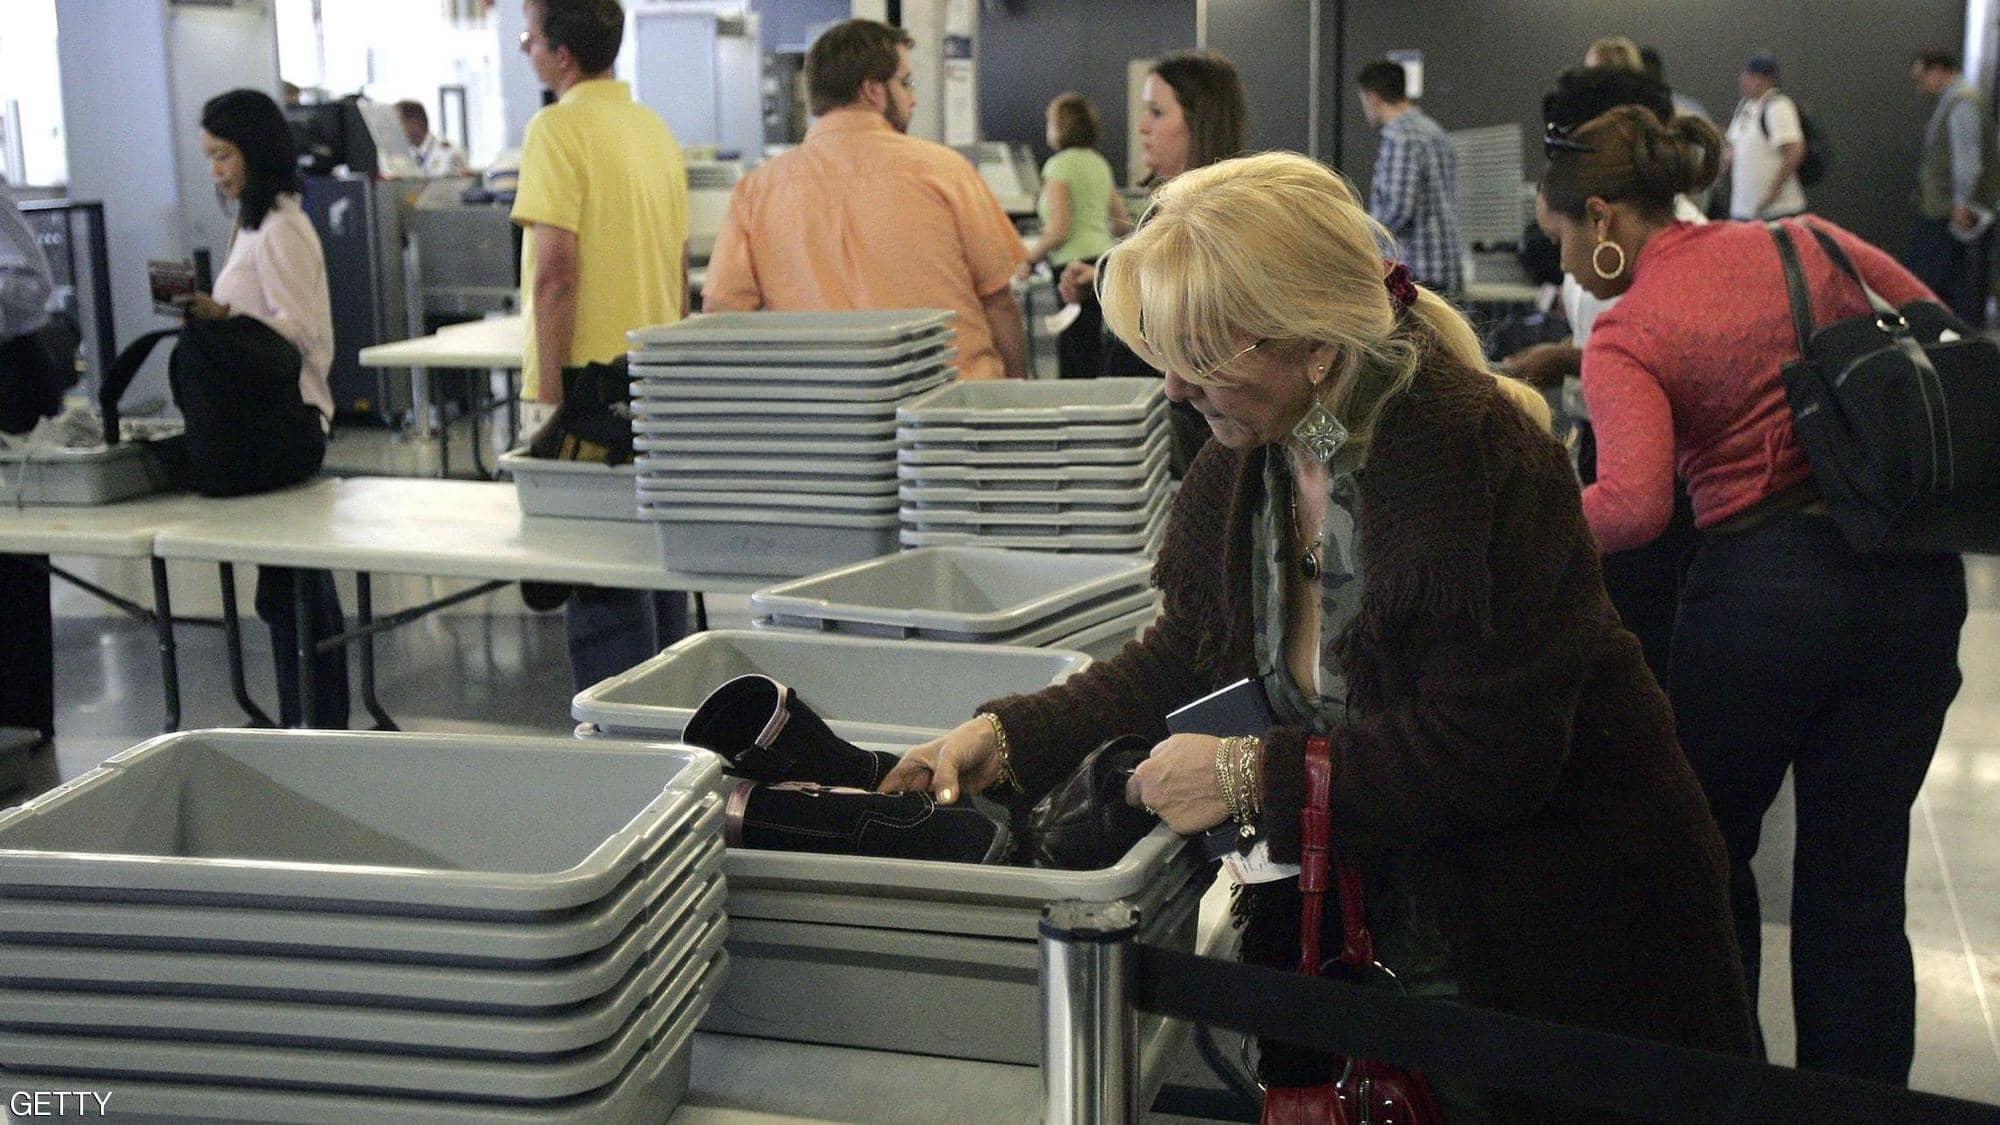 مسافرون فى مطار أمريكى